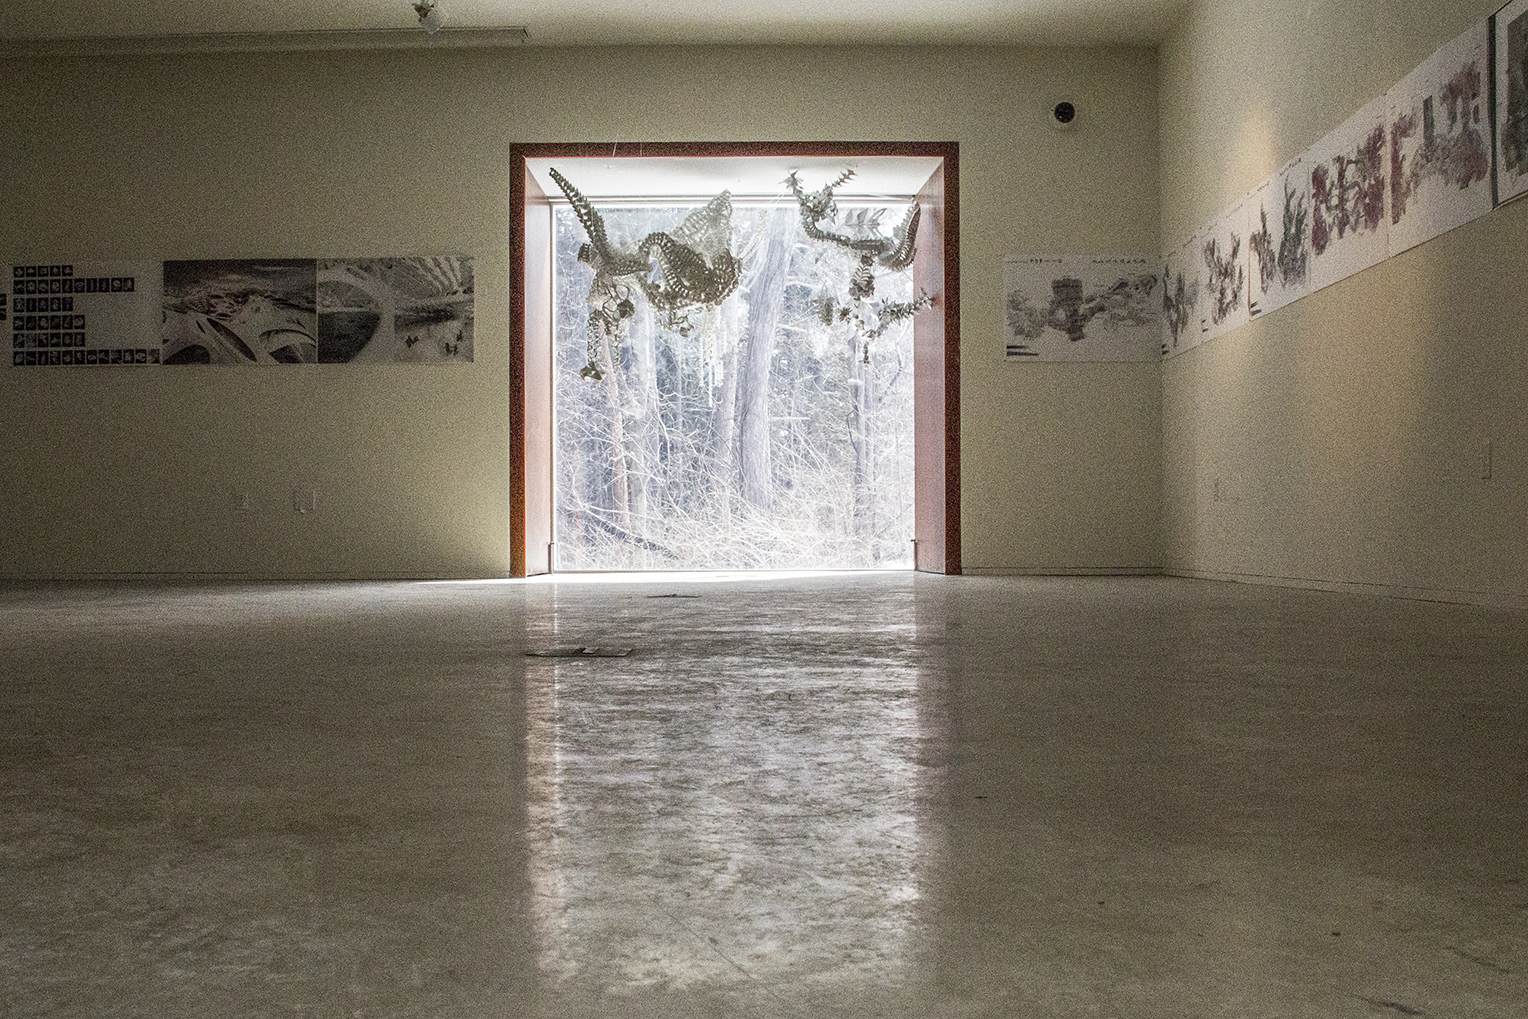 Cranbrook Academy of Art Forum Gallery, 2014.